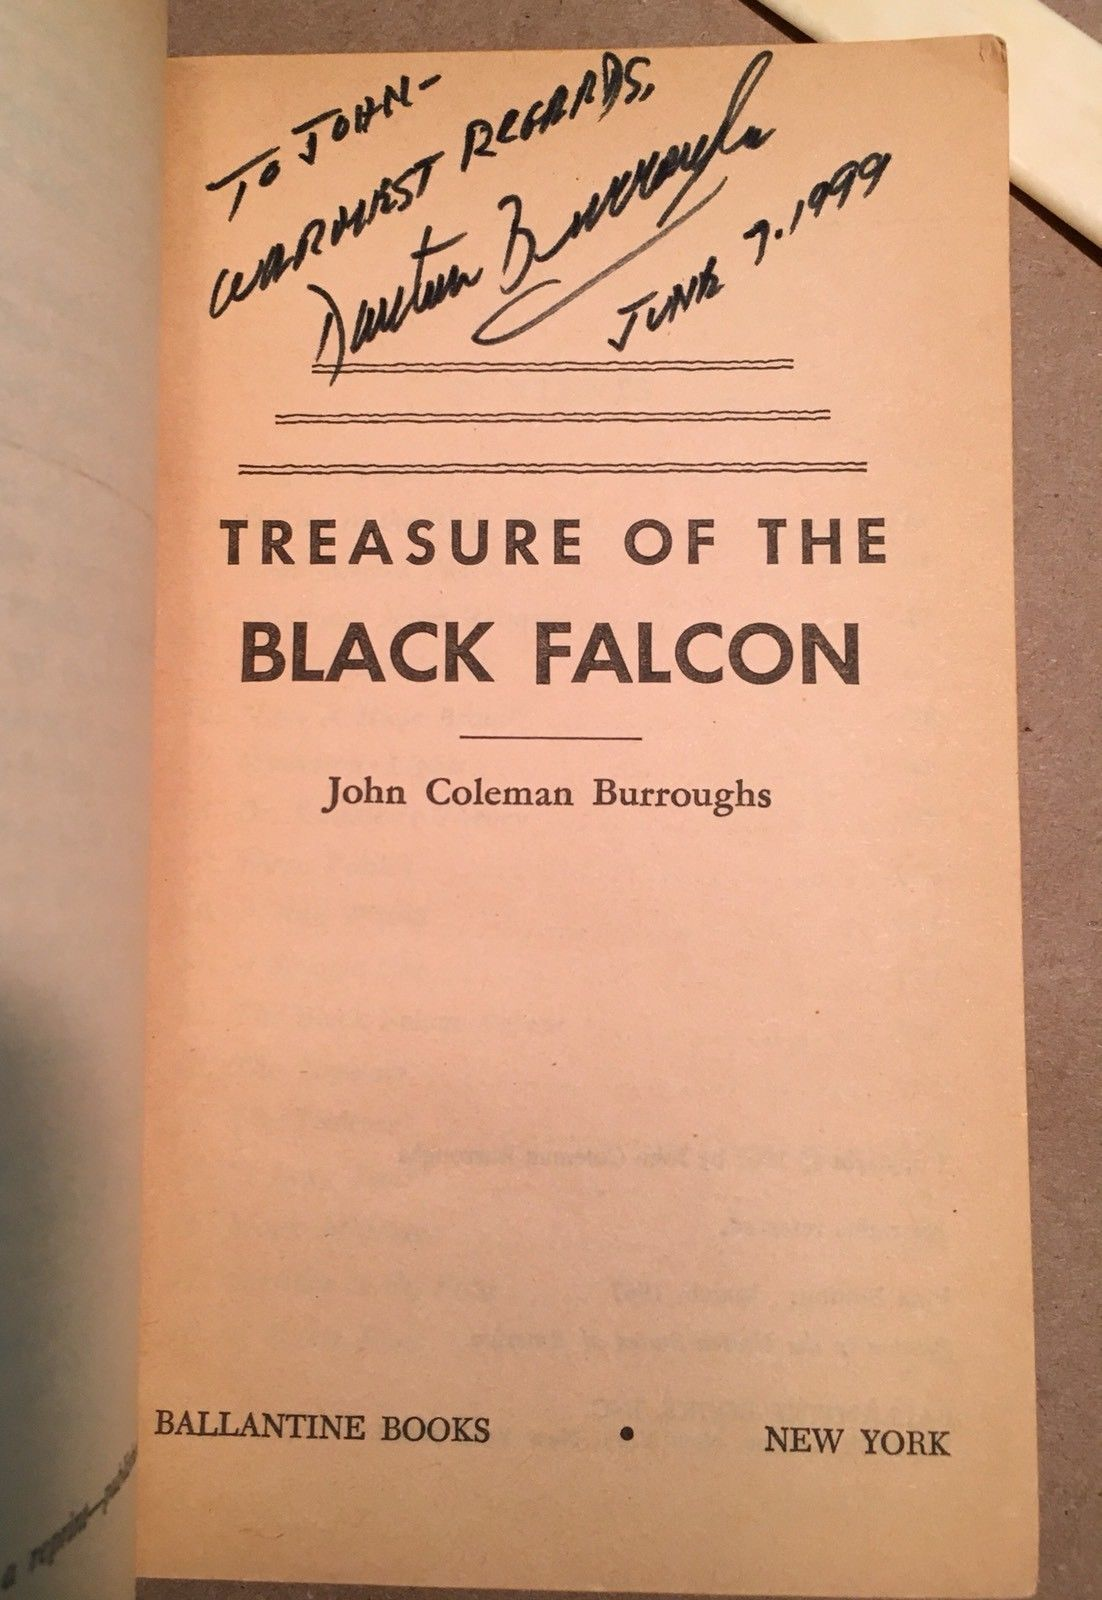 Treasure Of The Black Falcon U6085 John Coleman Burroughs 1967 signed